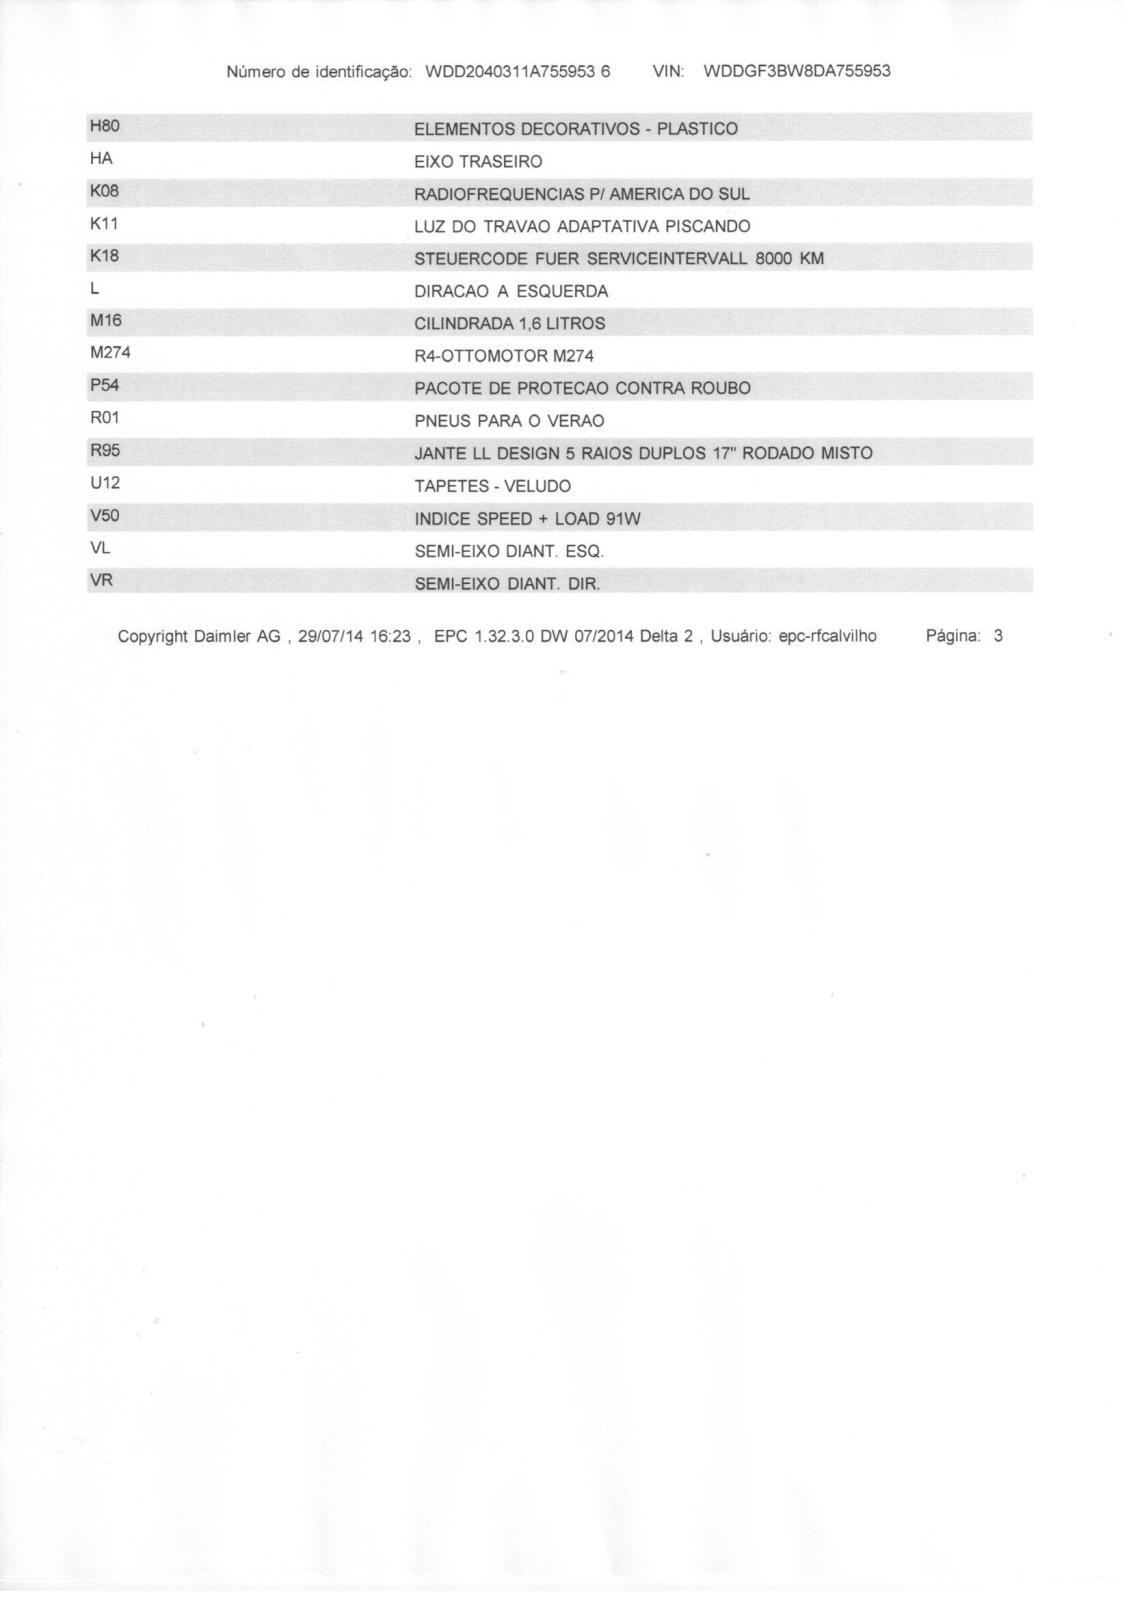 (CL203): Diferenças entre versões 2qu26u9